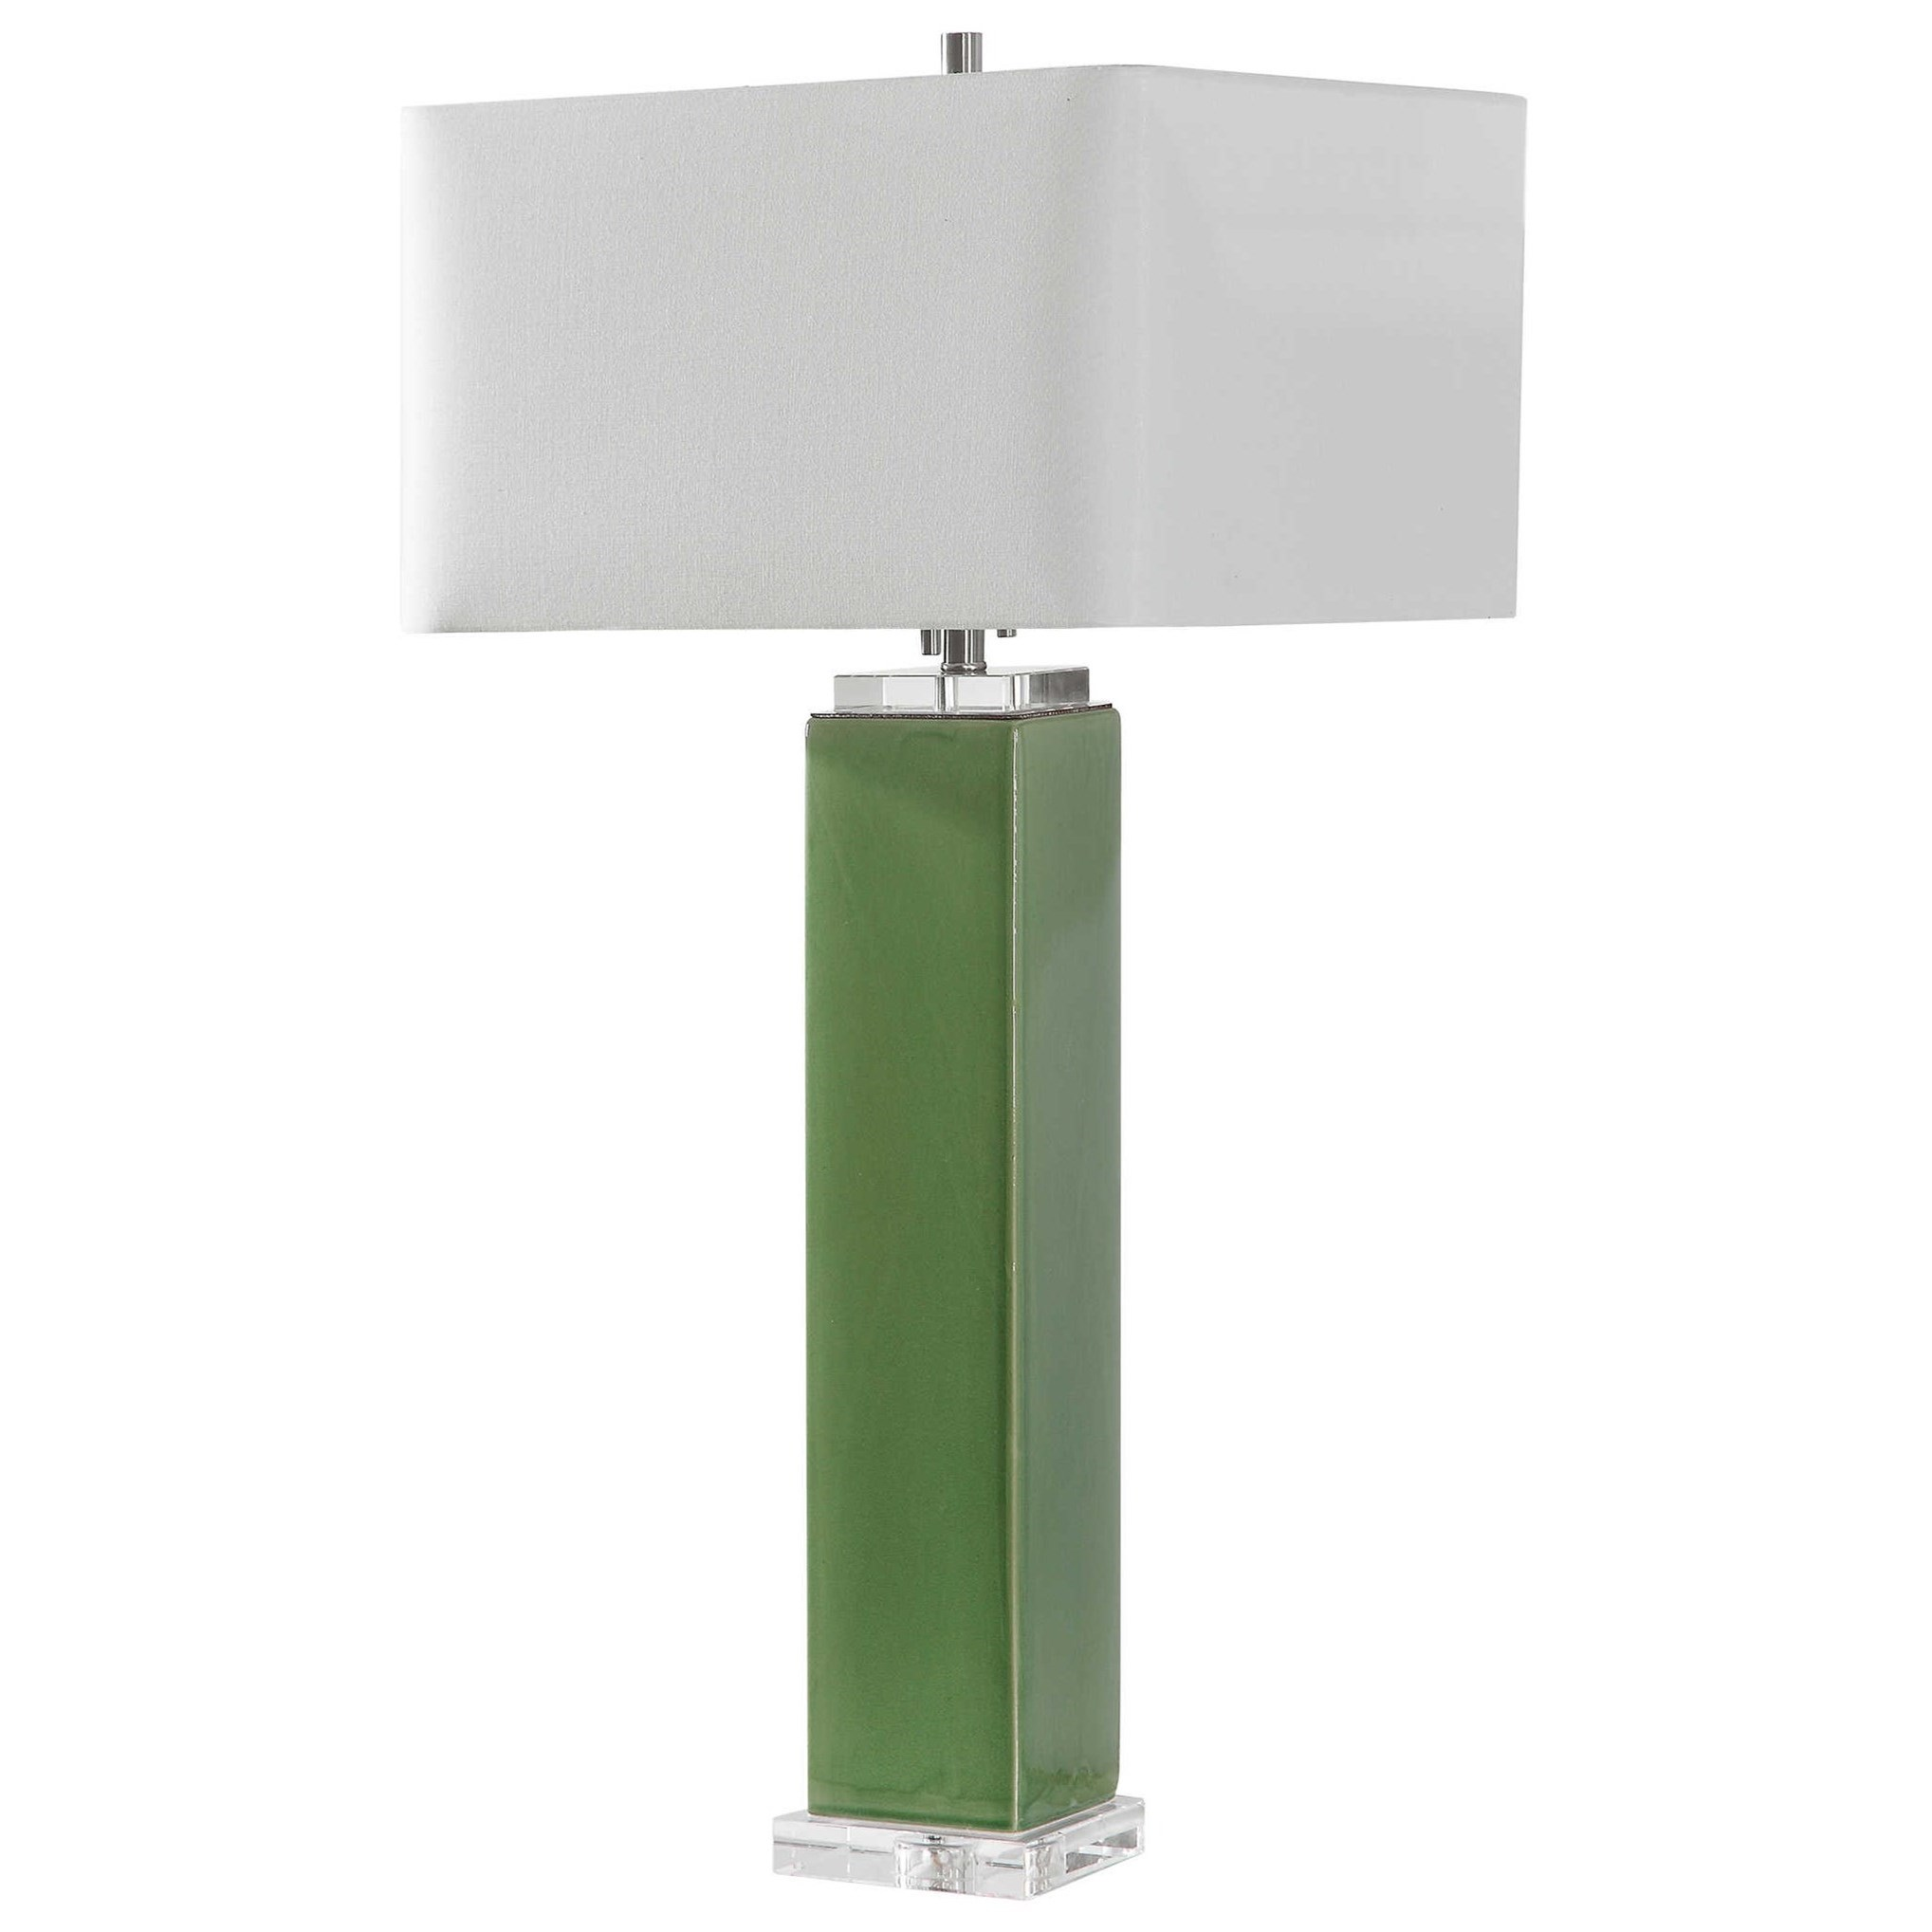 Aneeza Tropical Green Table Lamp